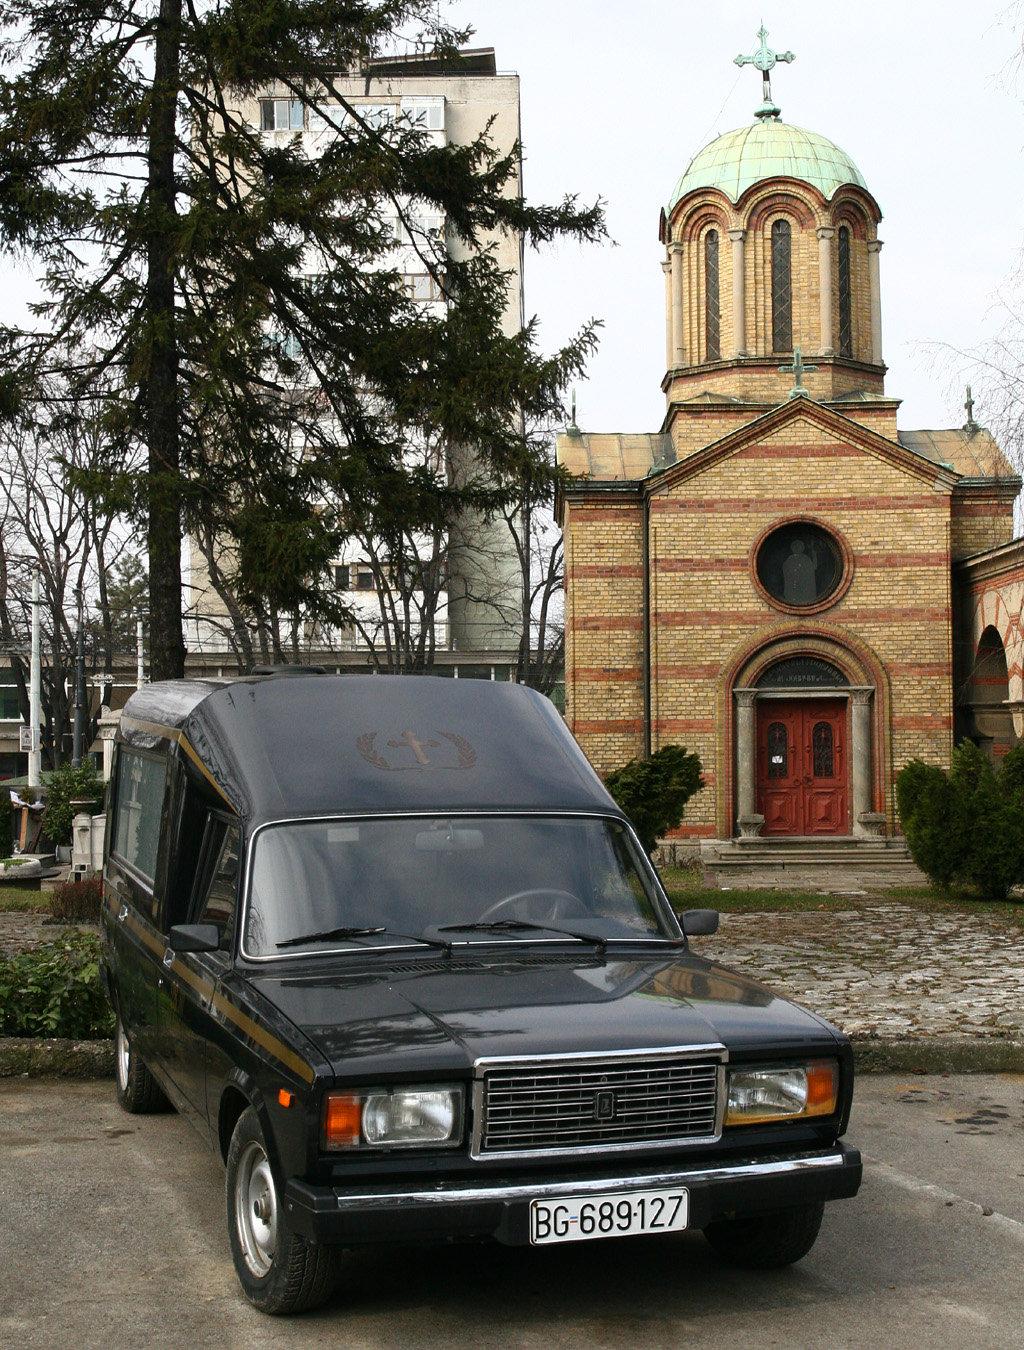 Lada 2107 Funeral Limousine Photos Reviews News Specs